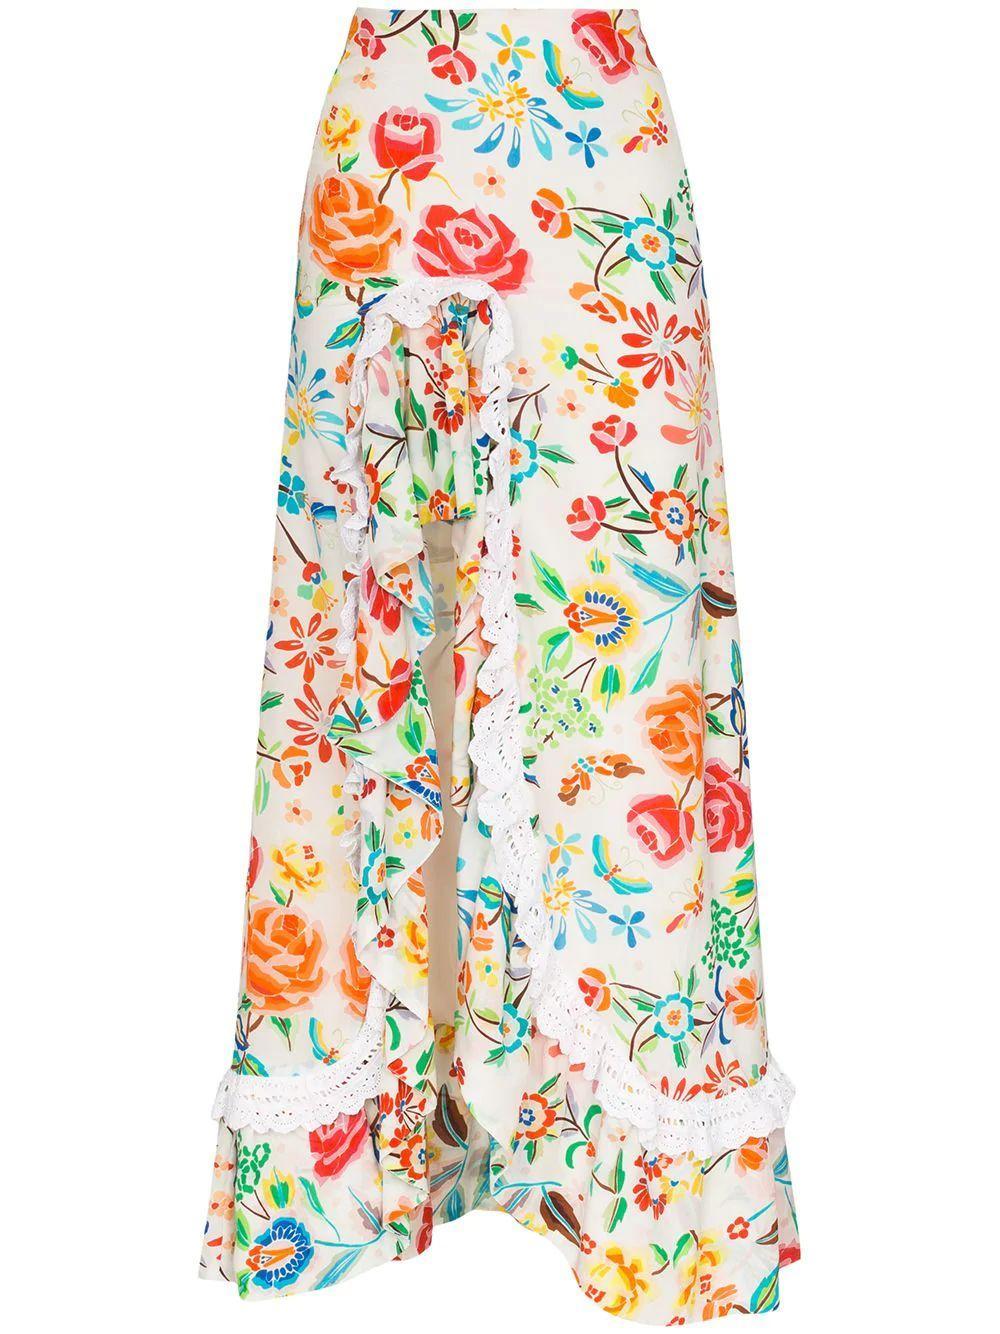 Clara Floral Skirt